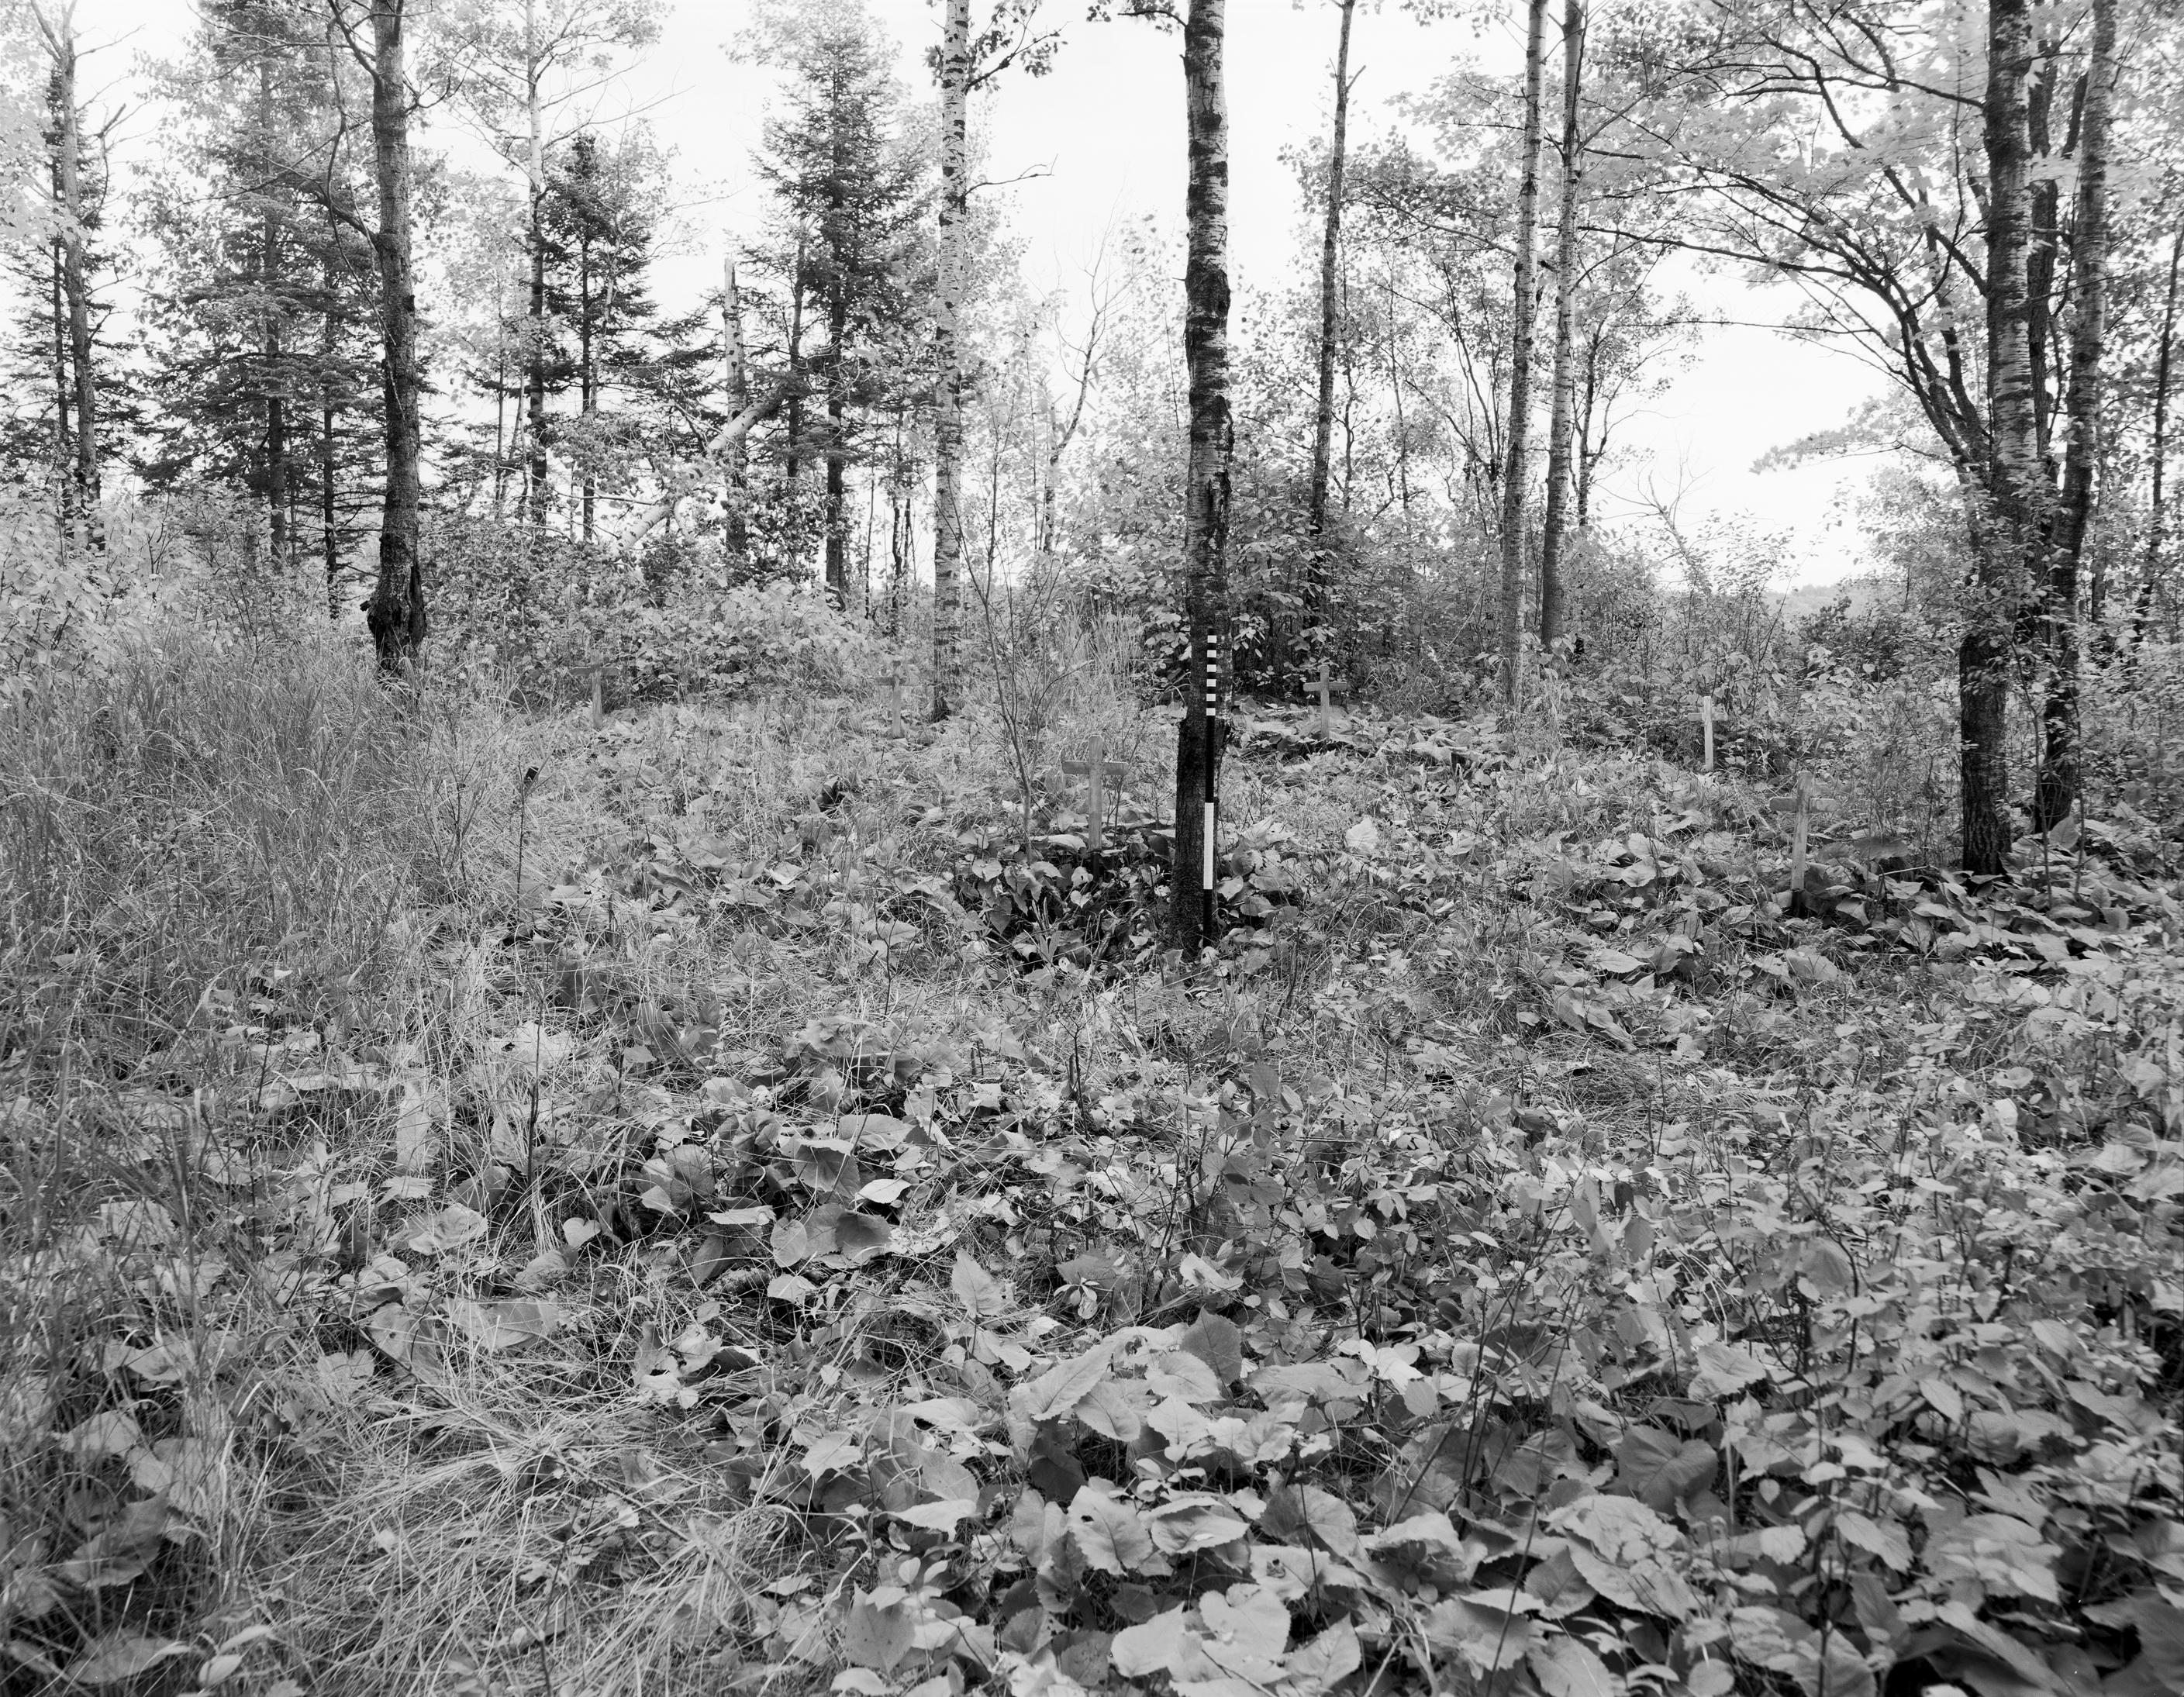 Iron Miner's Graves